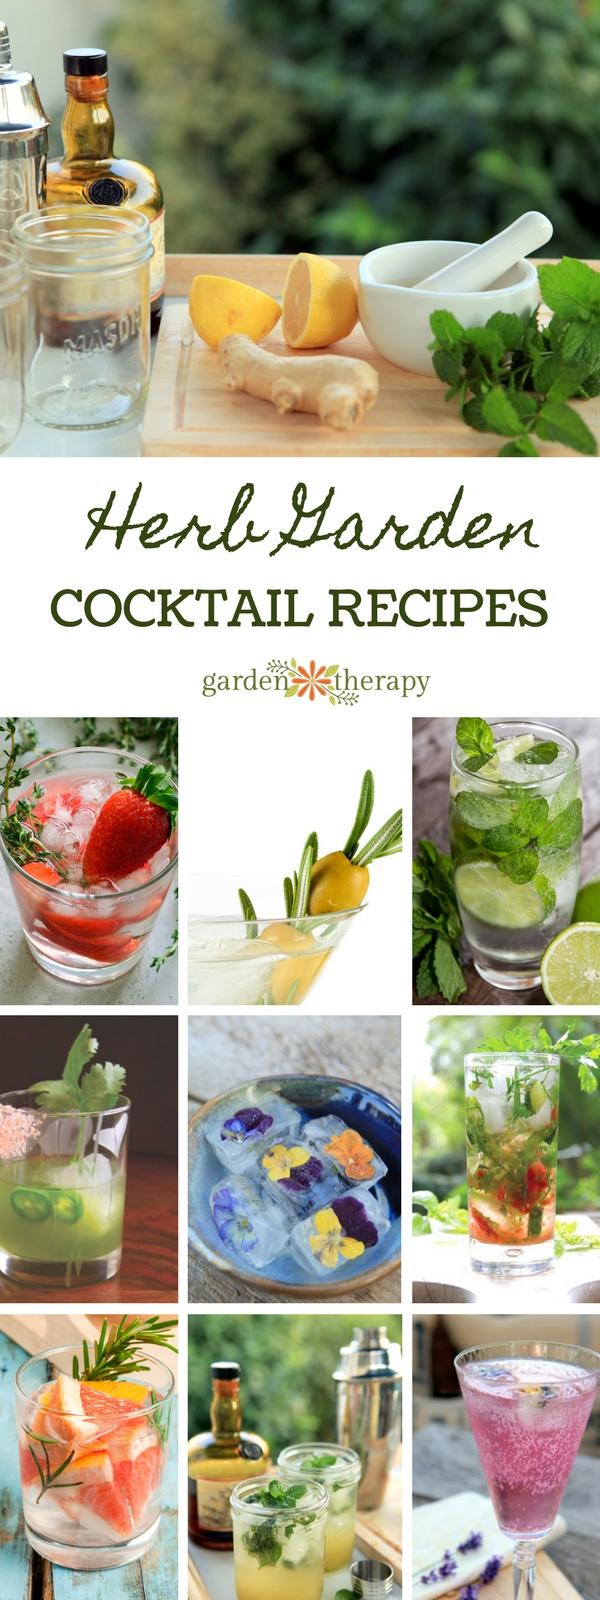 Herb Garden Cocktail Recipes